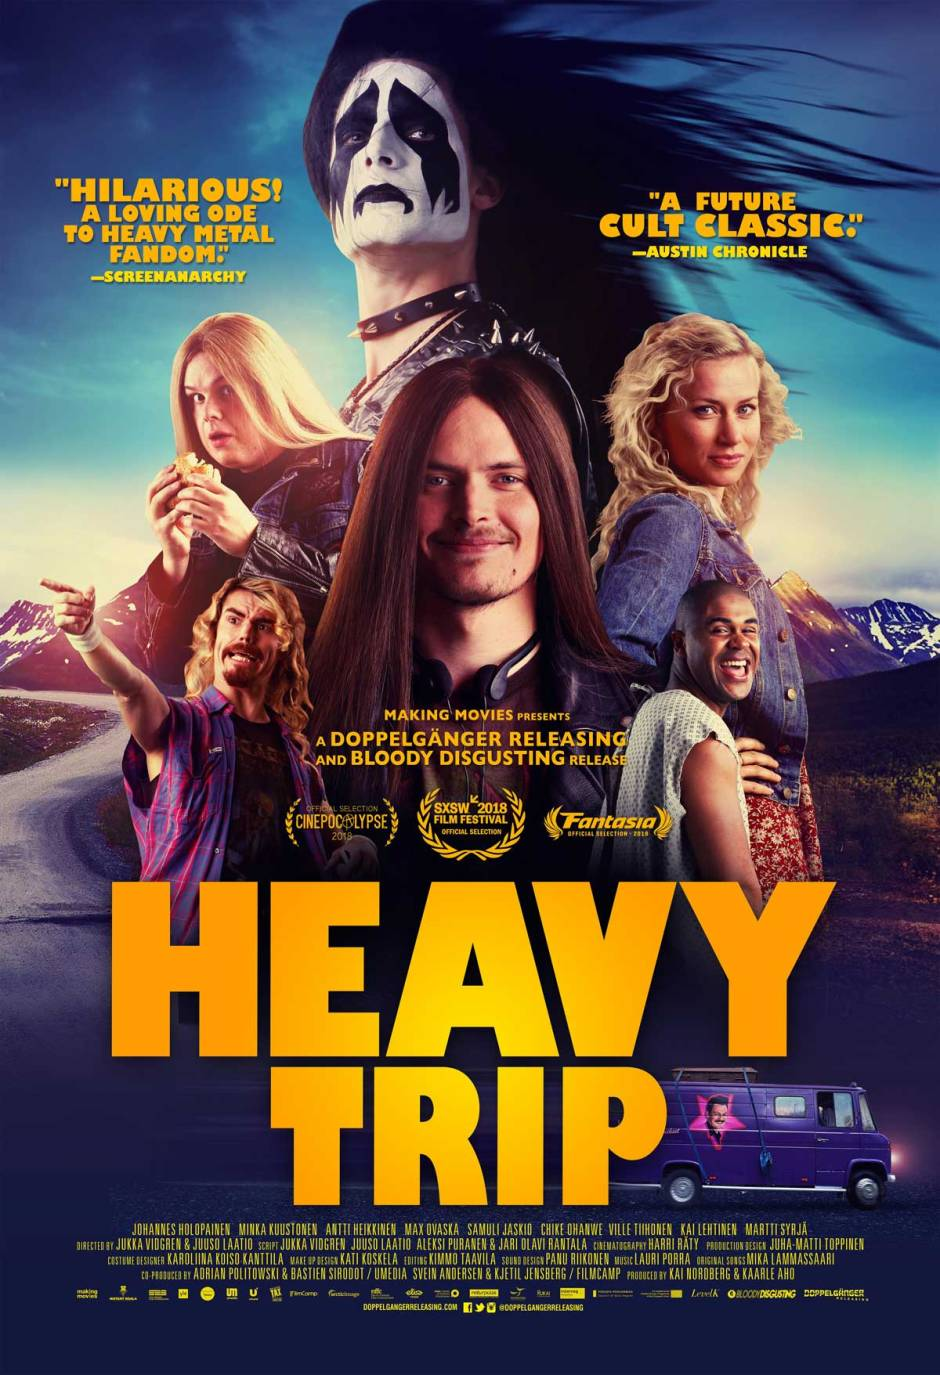 Heavy Trip film poster